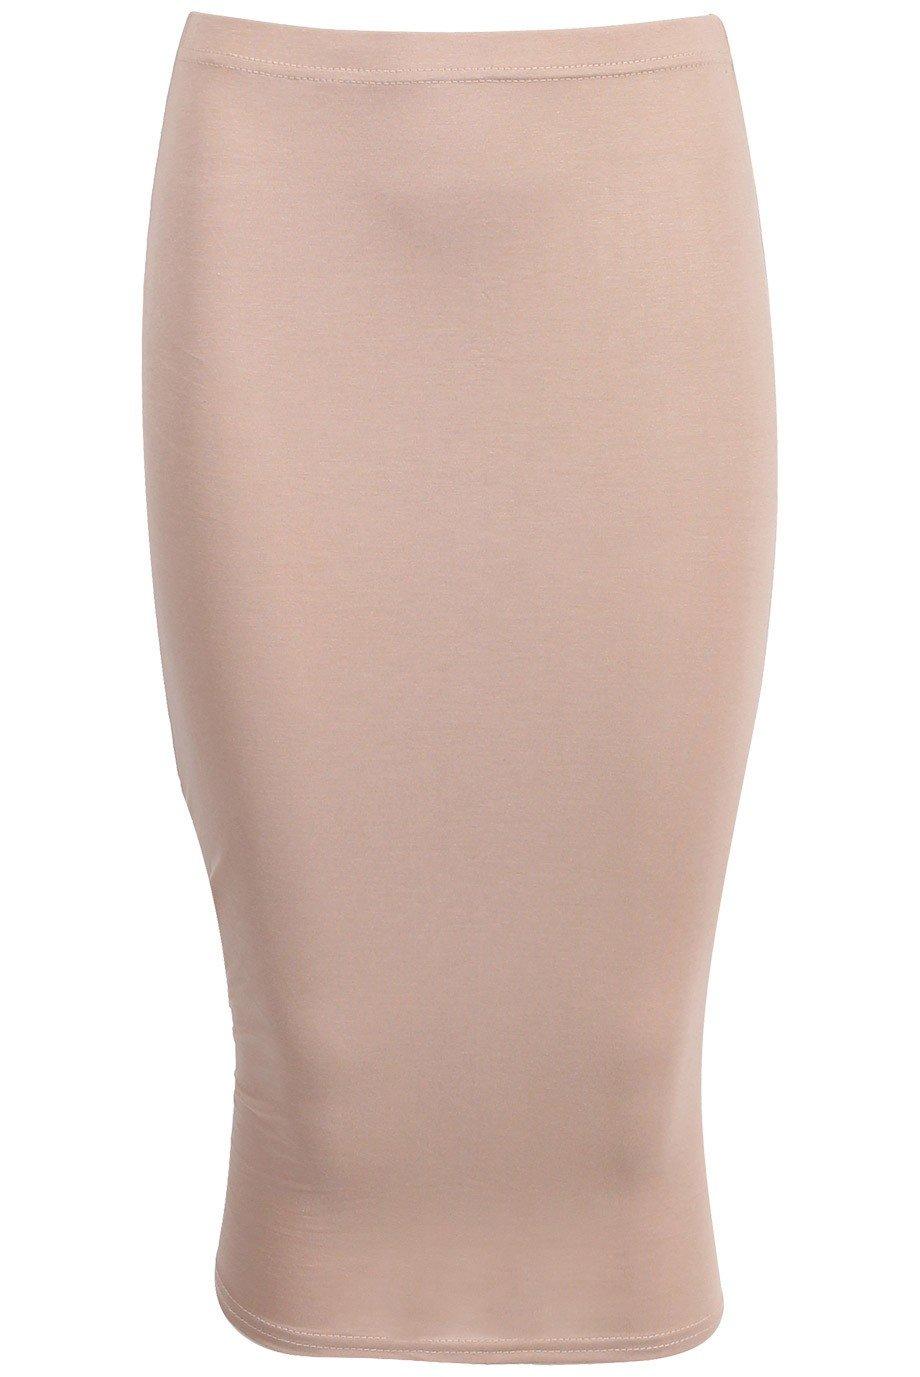 Ladies Girls Jersey Bodycon Pencil Skirt USA Size 6-12 (S/M (USA 6-8), Stone)